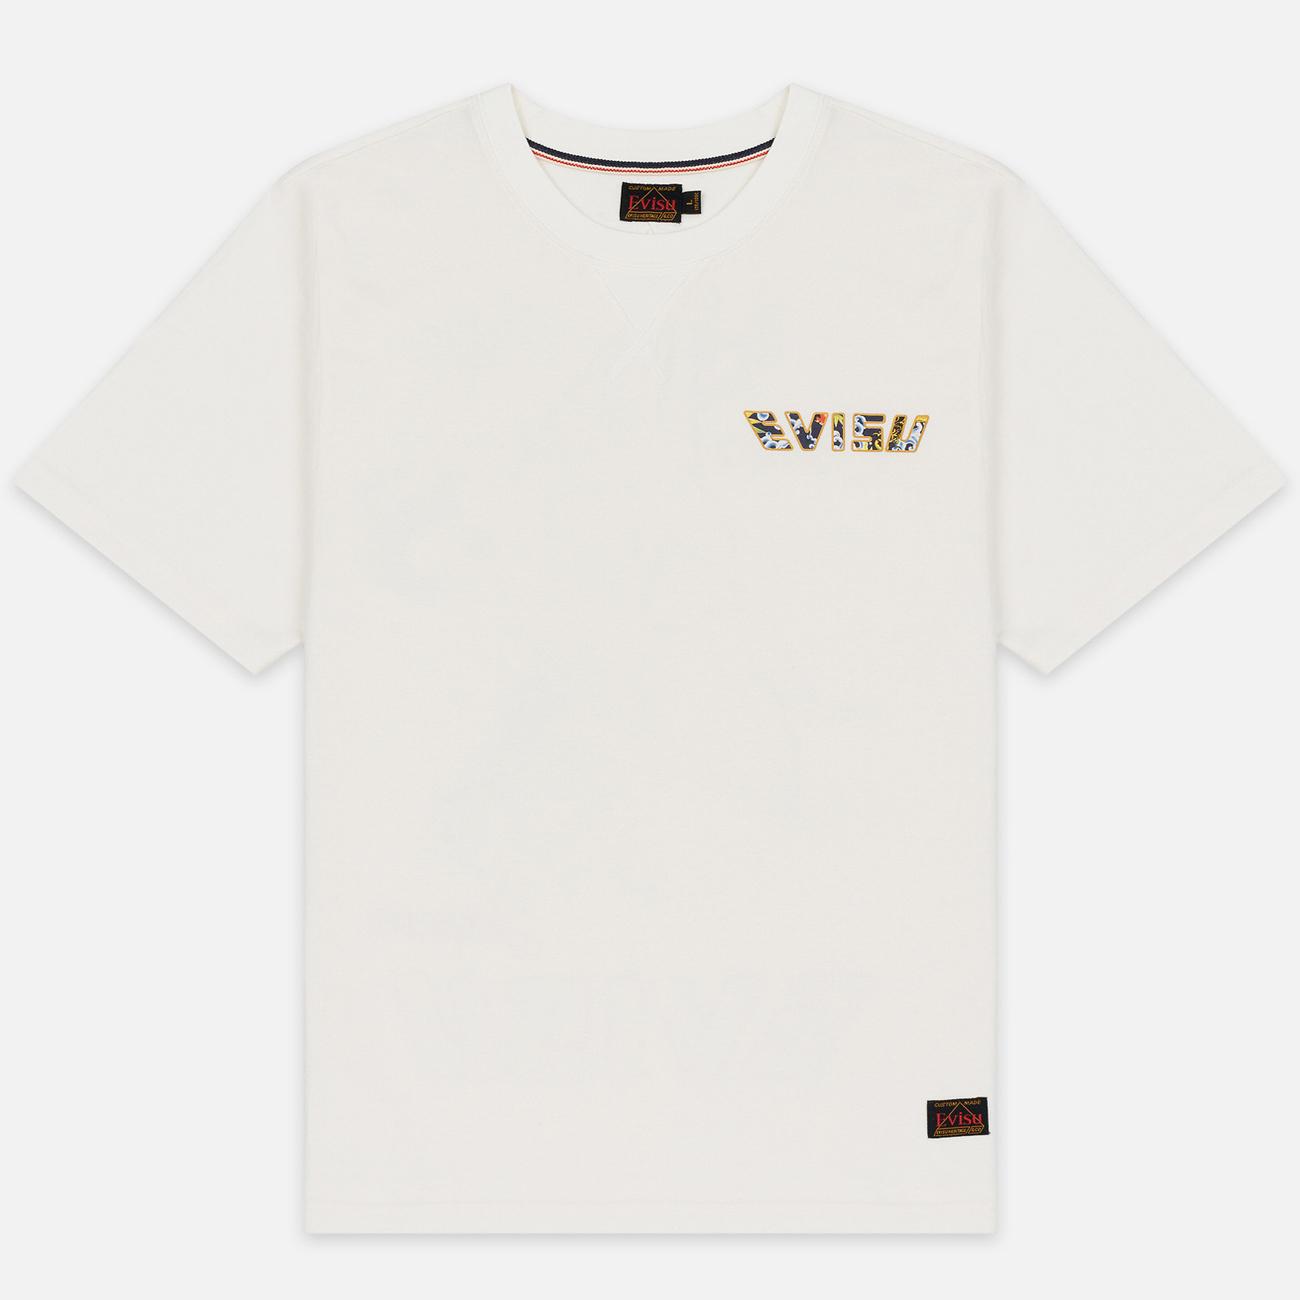 Мужская футболка Evisu Digital Printed Carp Pattern Off White